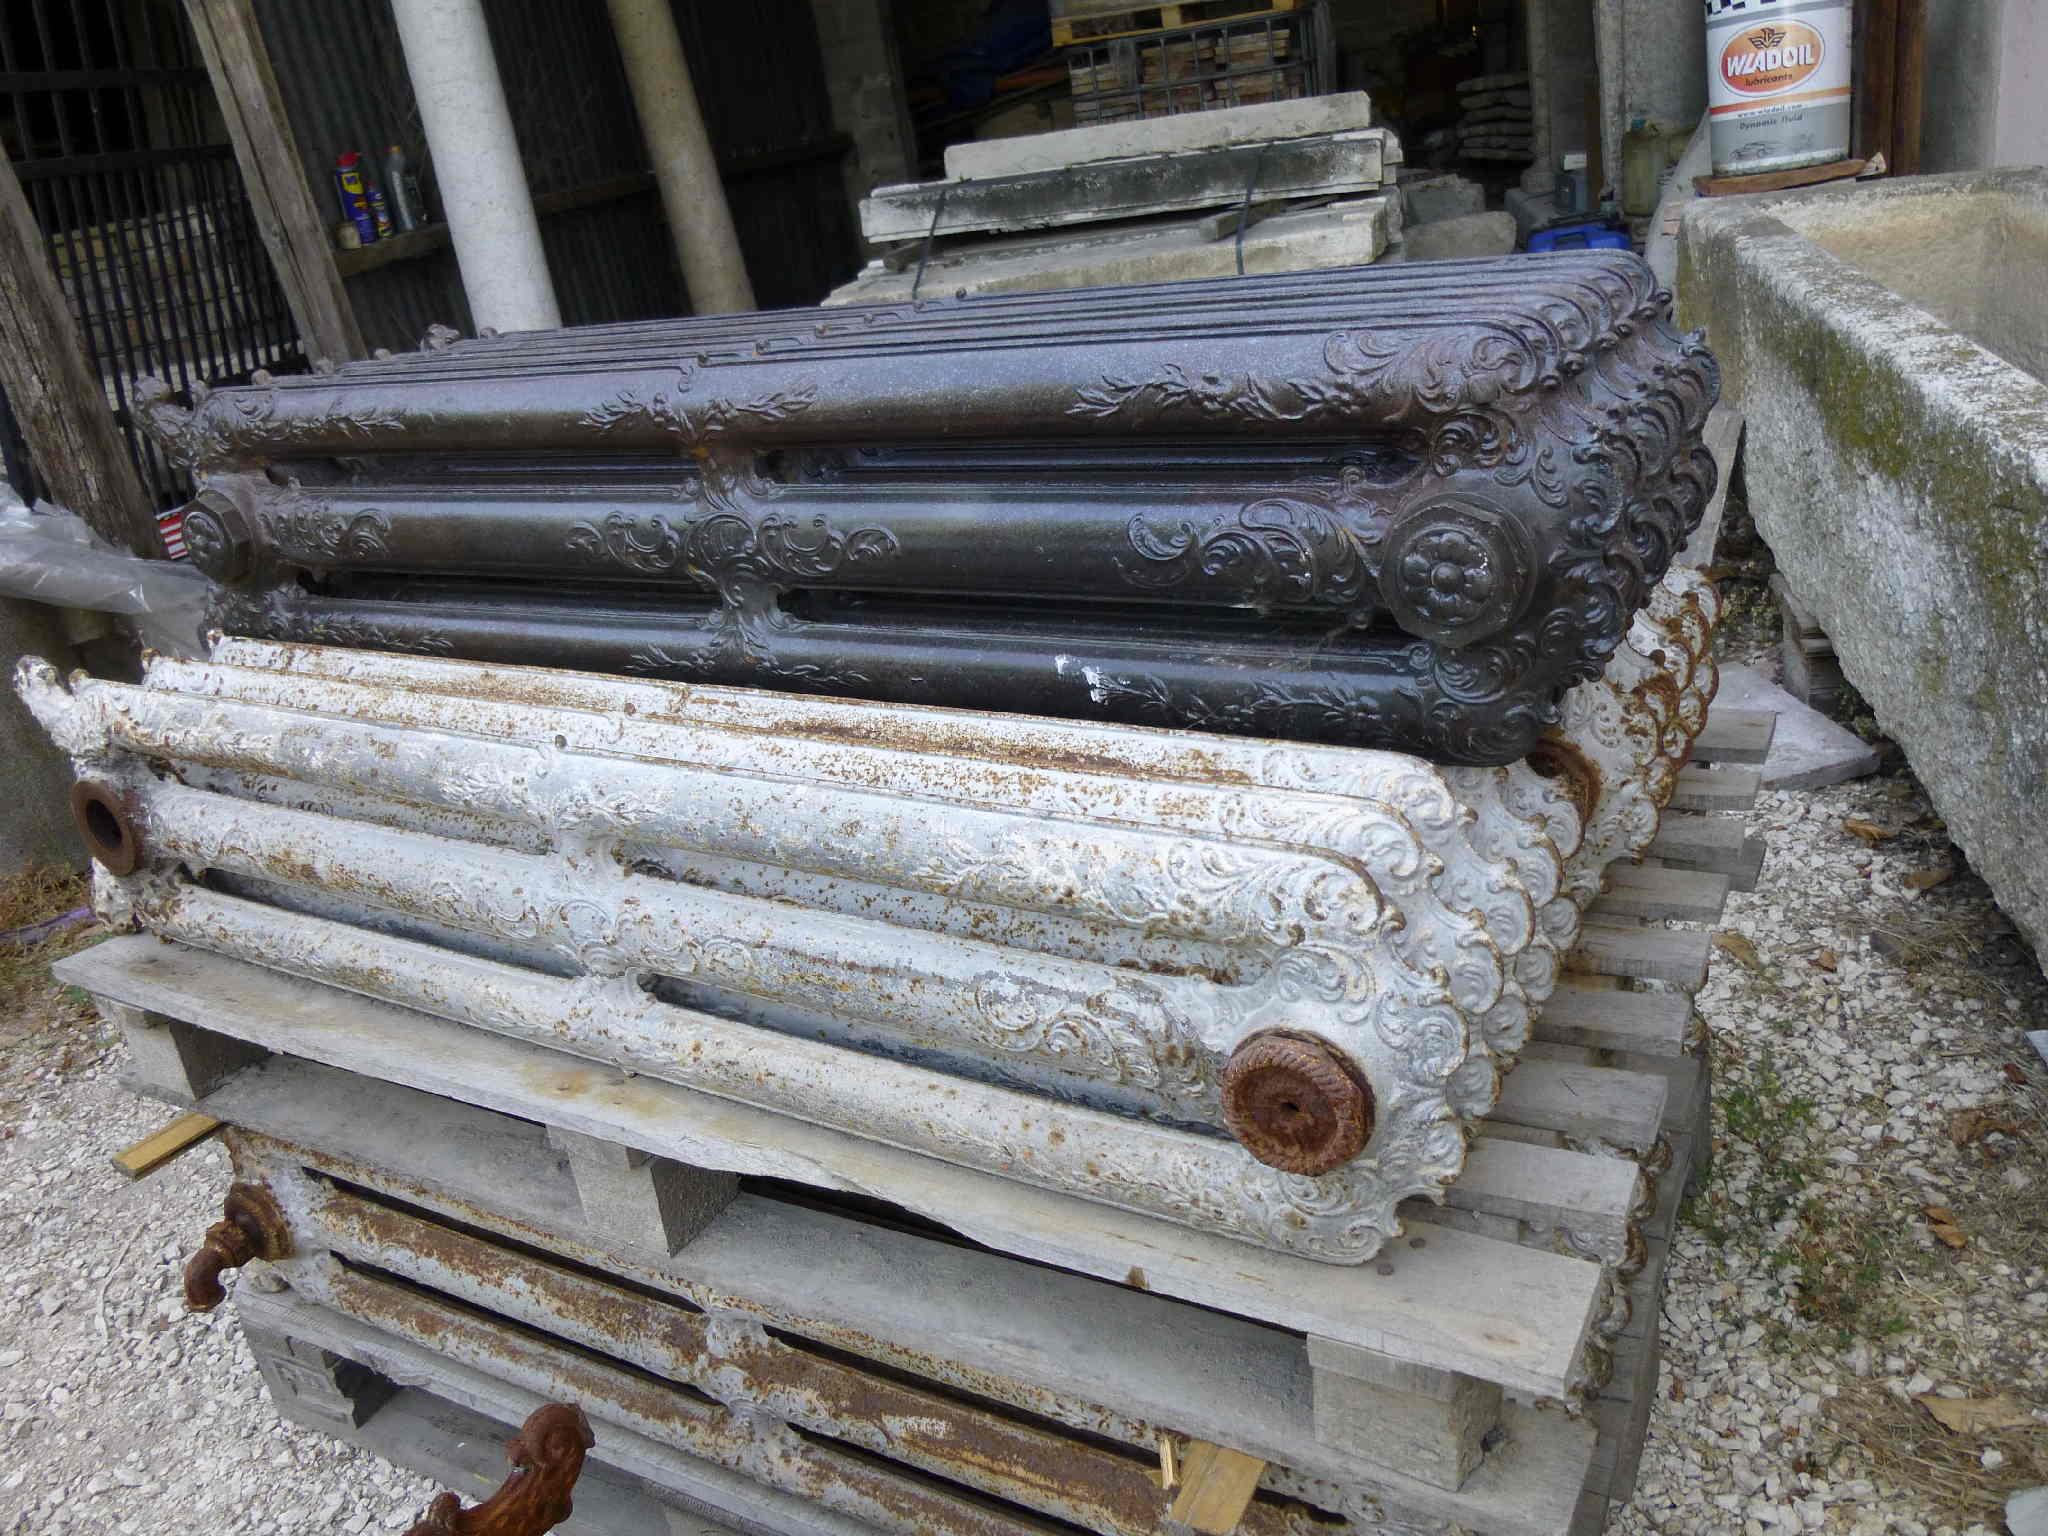 Costo Termosifoni In Ghisa termosifoni antichi in ghisa - recupero materiali